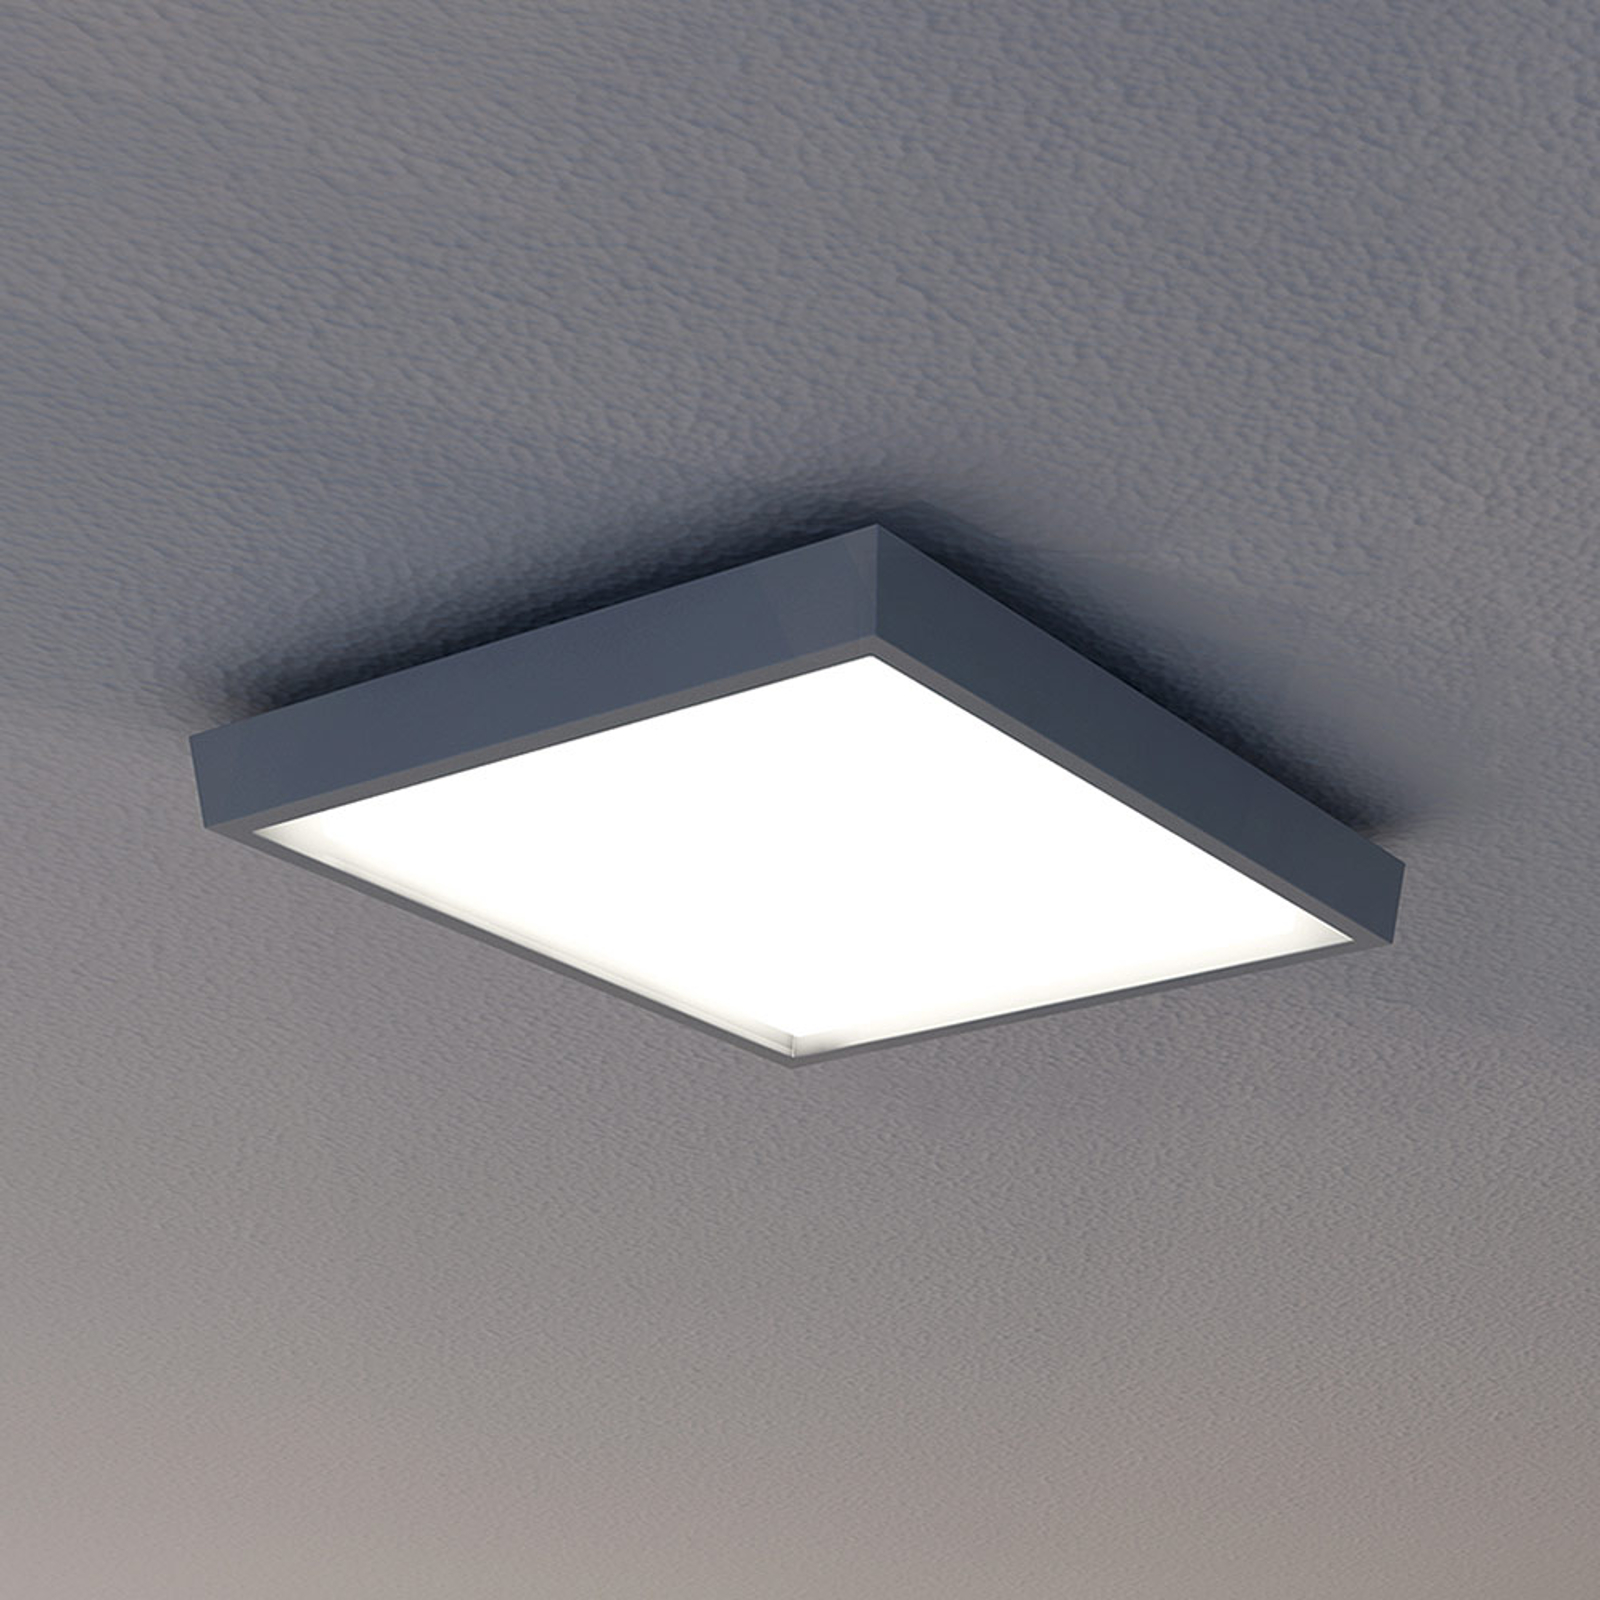 LED-ulkokattovalaisin IP54, antrasiitti, 27x27 cm